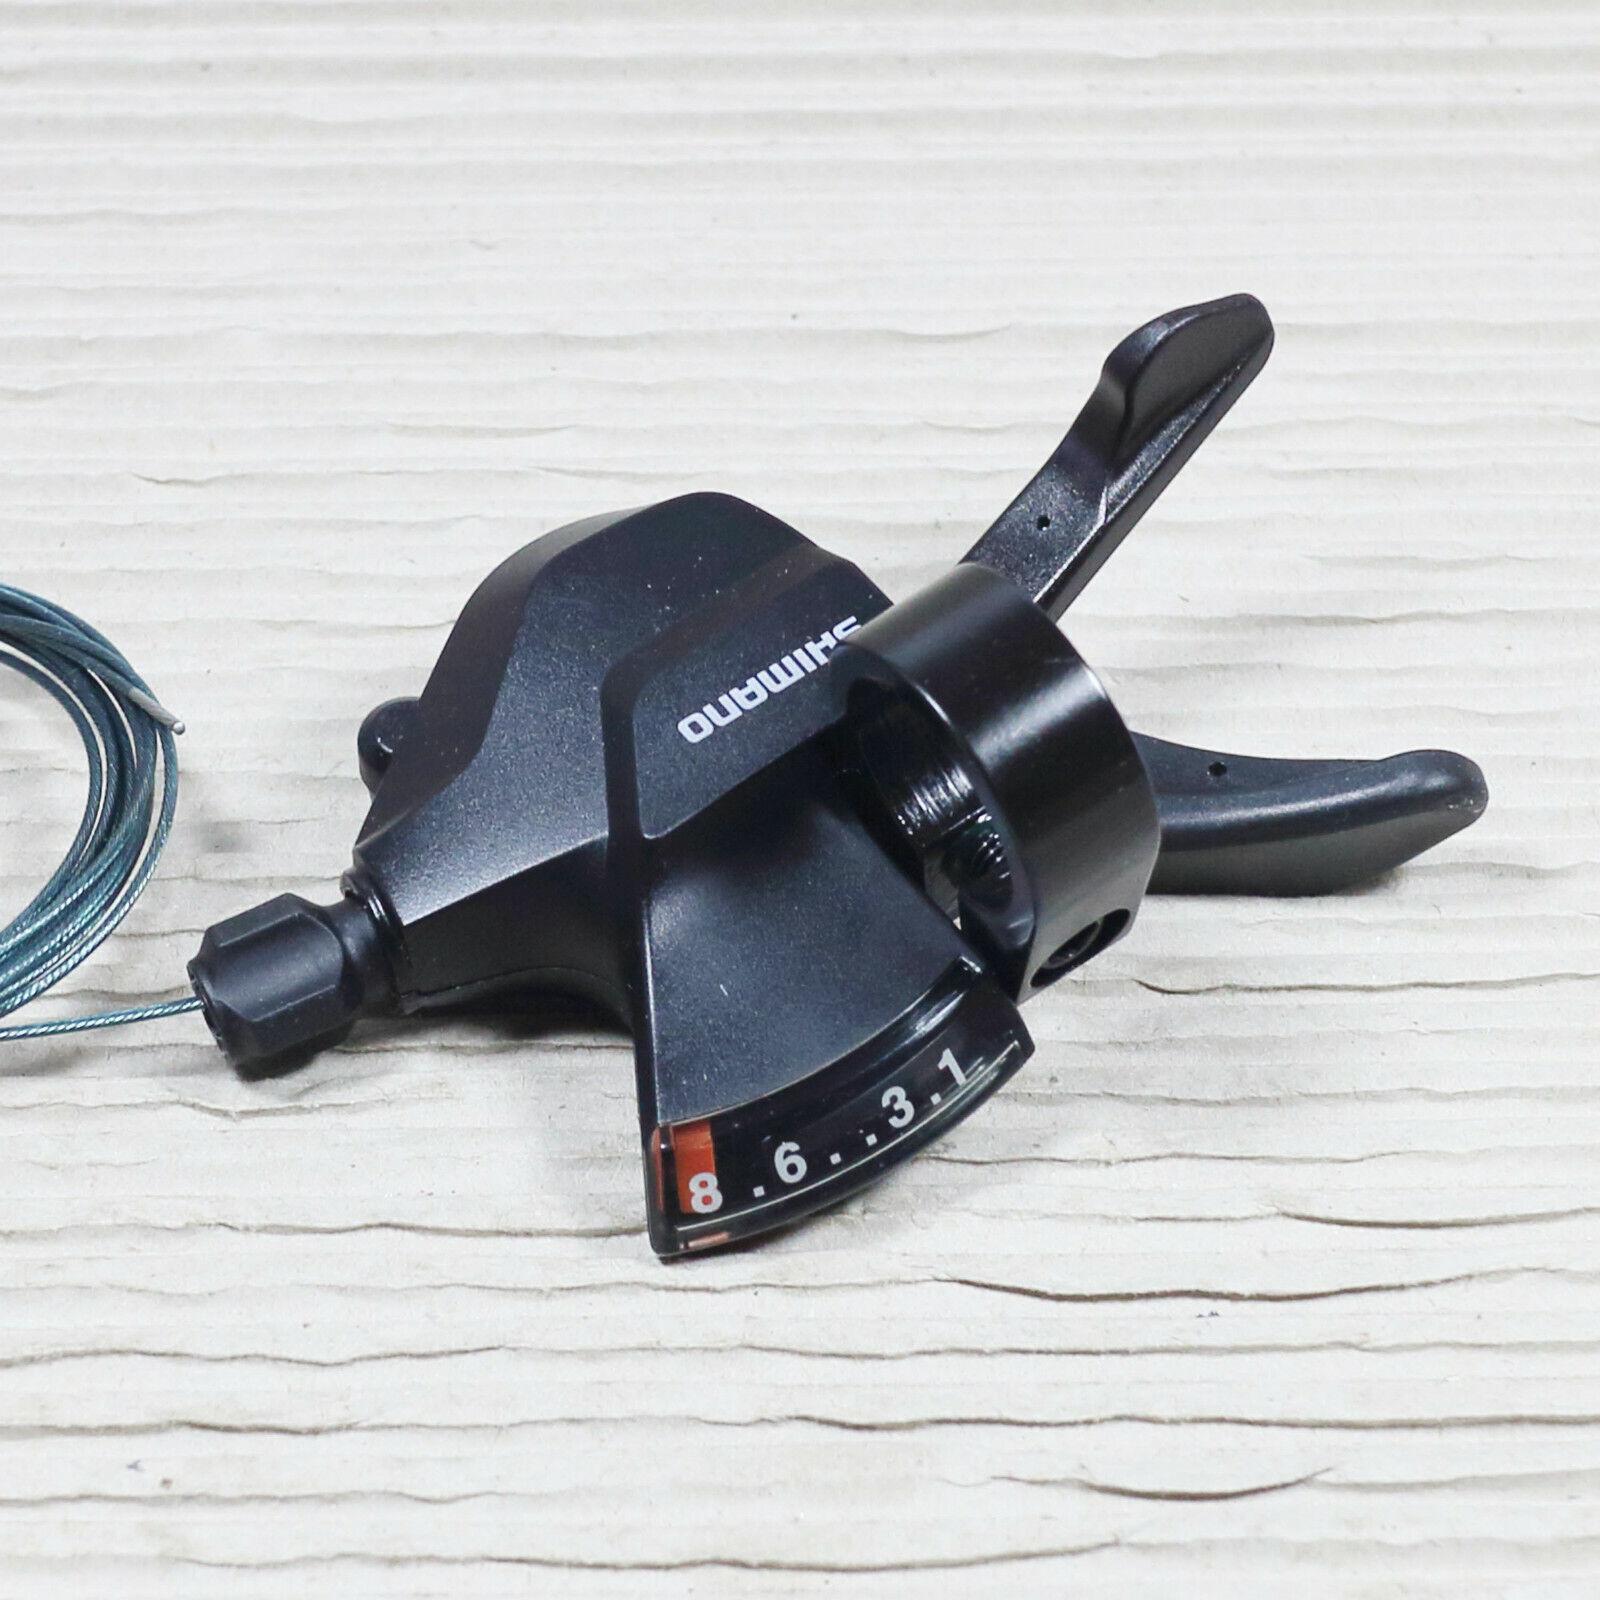 Shimano Schalthebel Set SL Hülle M315 schwarz 3x8  24Gang inkl Schaltzug